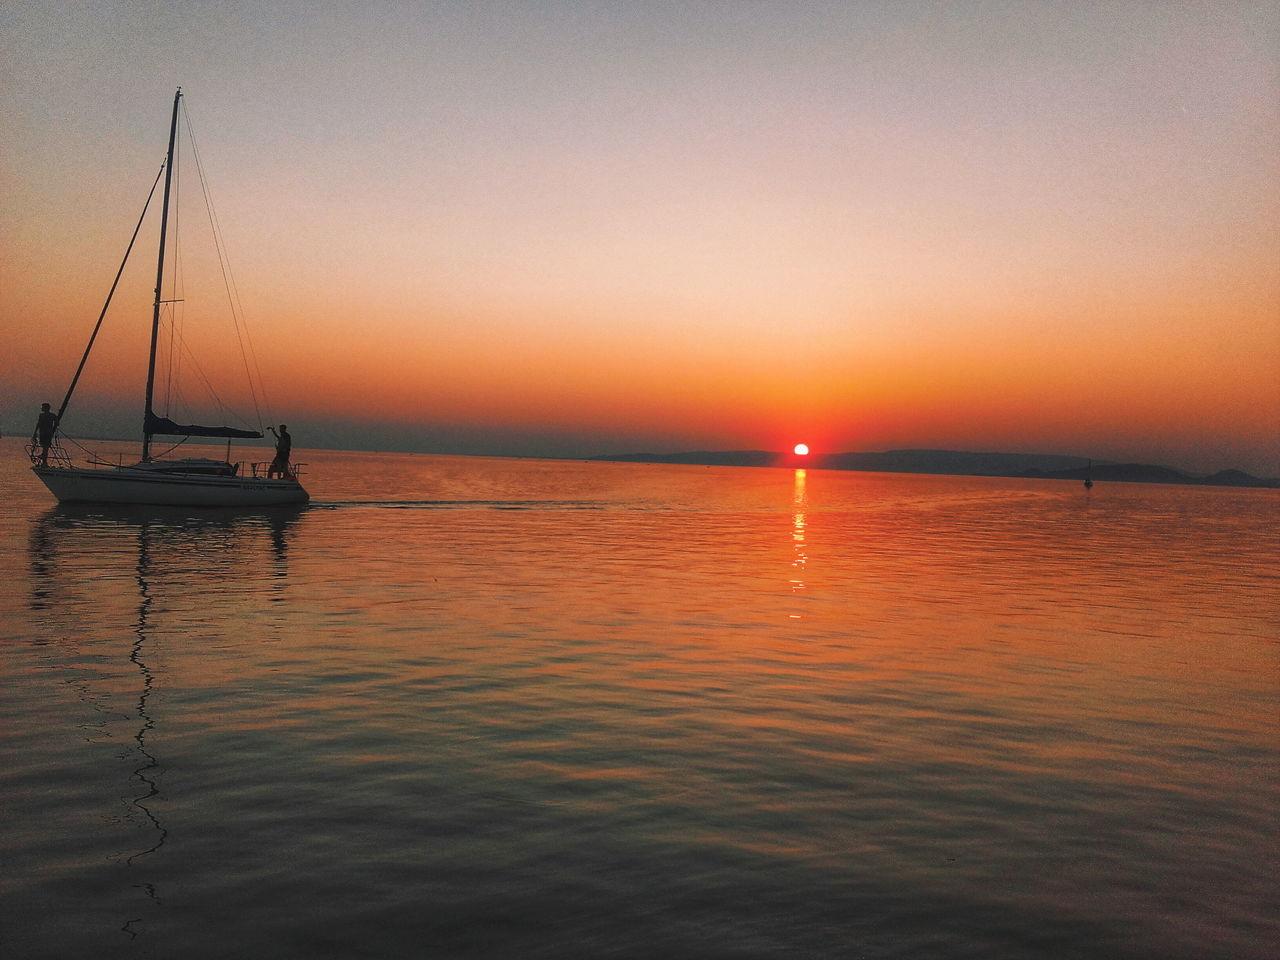 Lake Balaton Lake Boat Sunset Nature Summer ☀ Colors Of Nature Colors Calm Water Calm Orange Sky Orange Color Orange Sunset Beautiful Beach